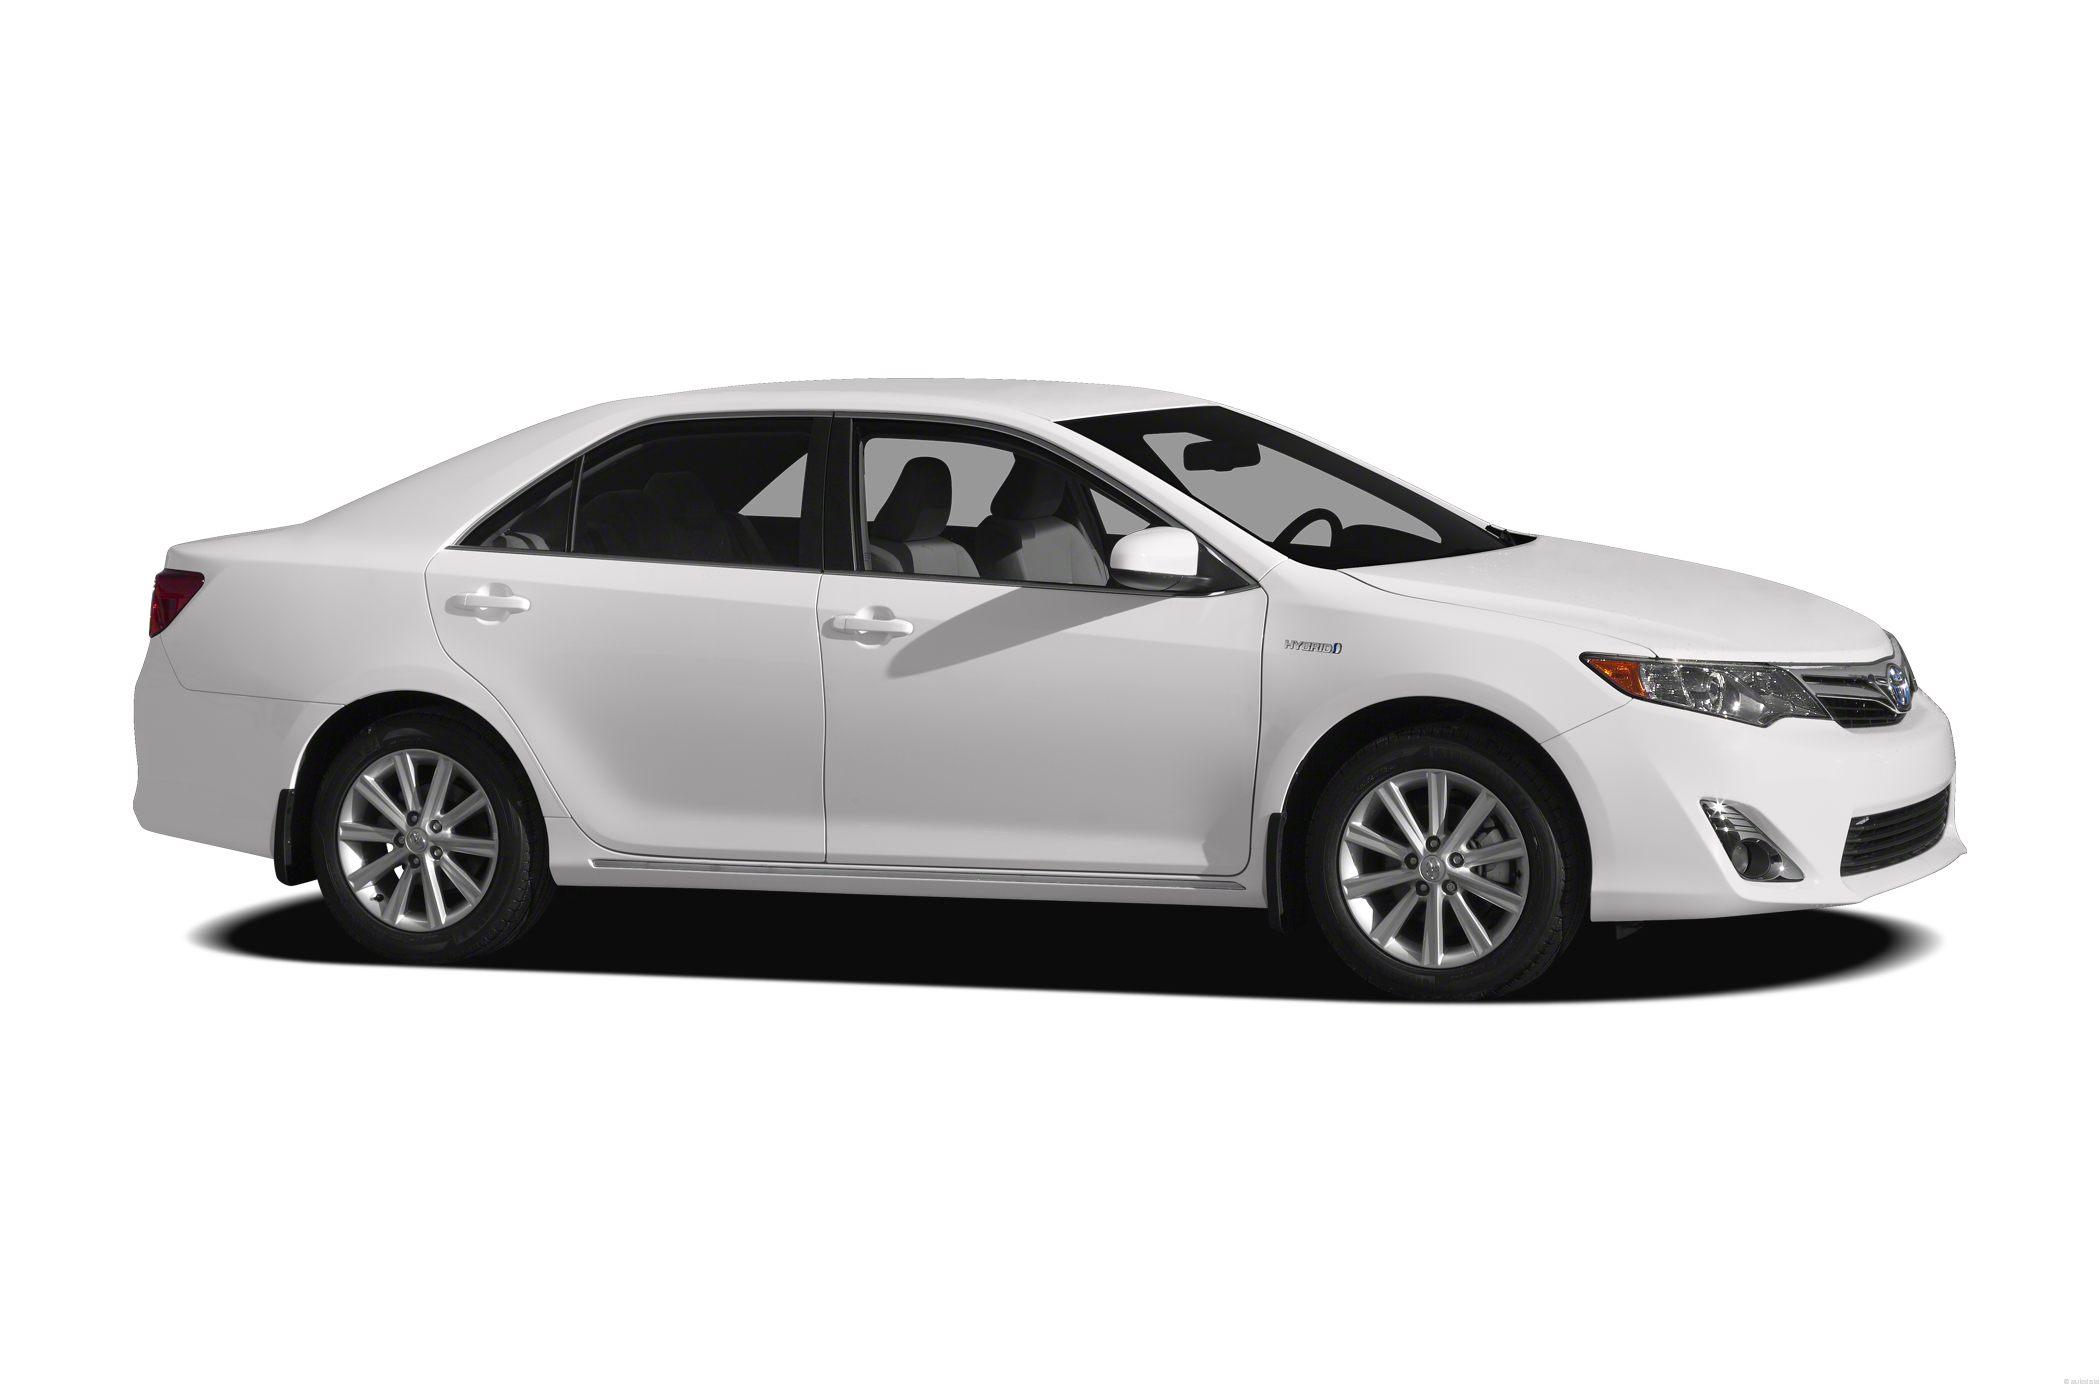 2012 Toyota Camry Hybrid Image 13